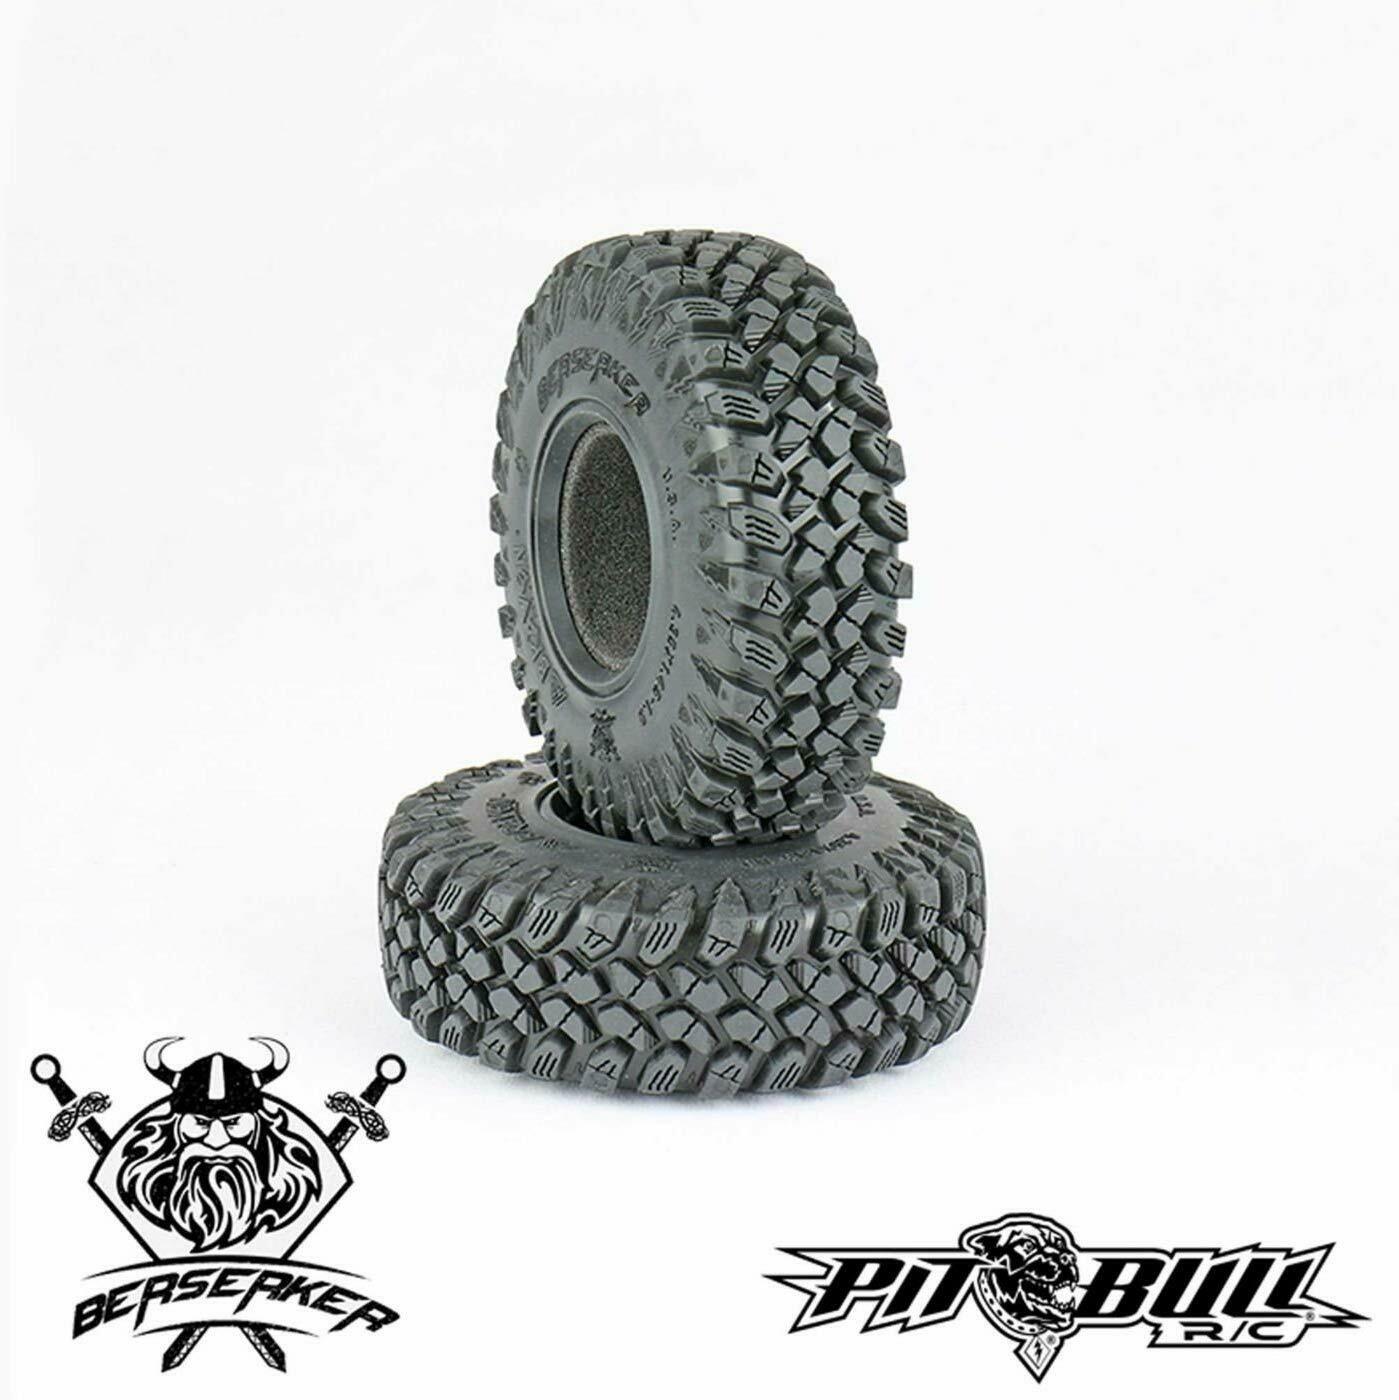 "Pitbull Tires Braven Berserker 1.55"" Scale Crawler Tires, Alien Kompound, w/ Foams, (2)"